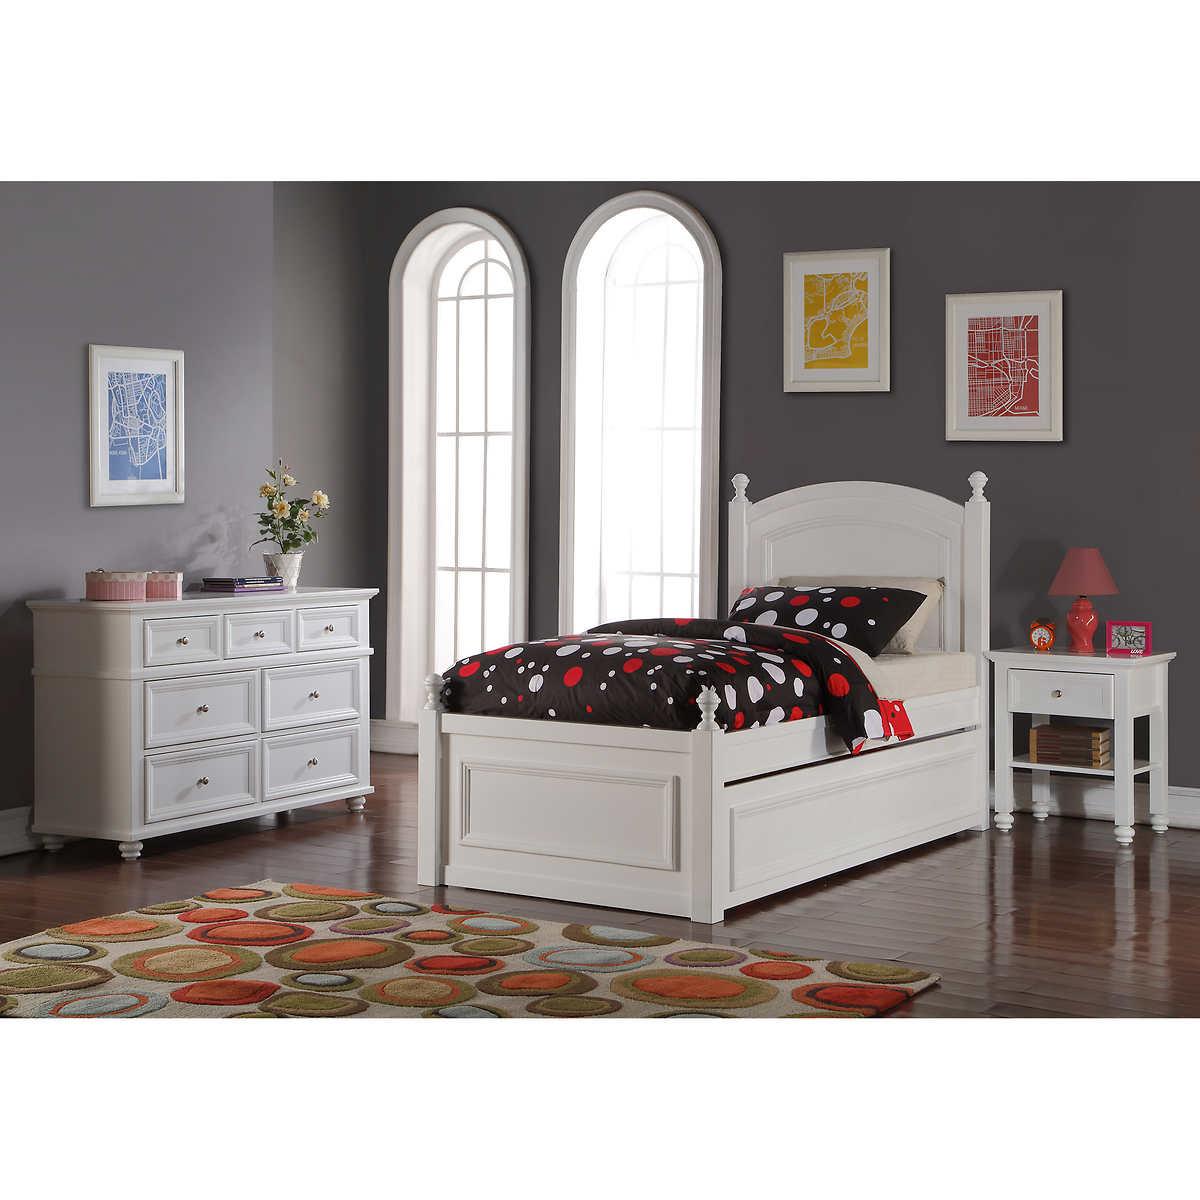 Hailey 3 piece Twin Bedroom Set. Twin Bedroom Sets